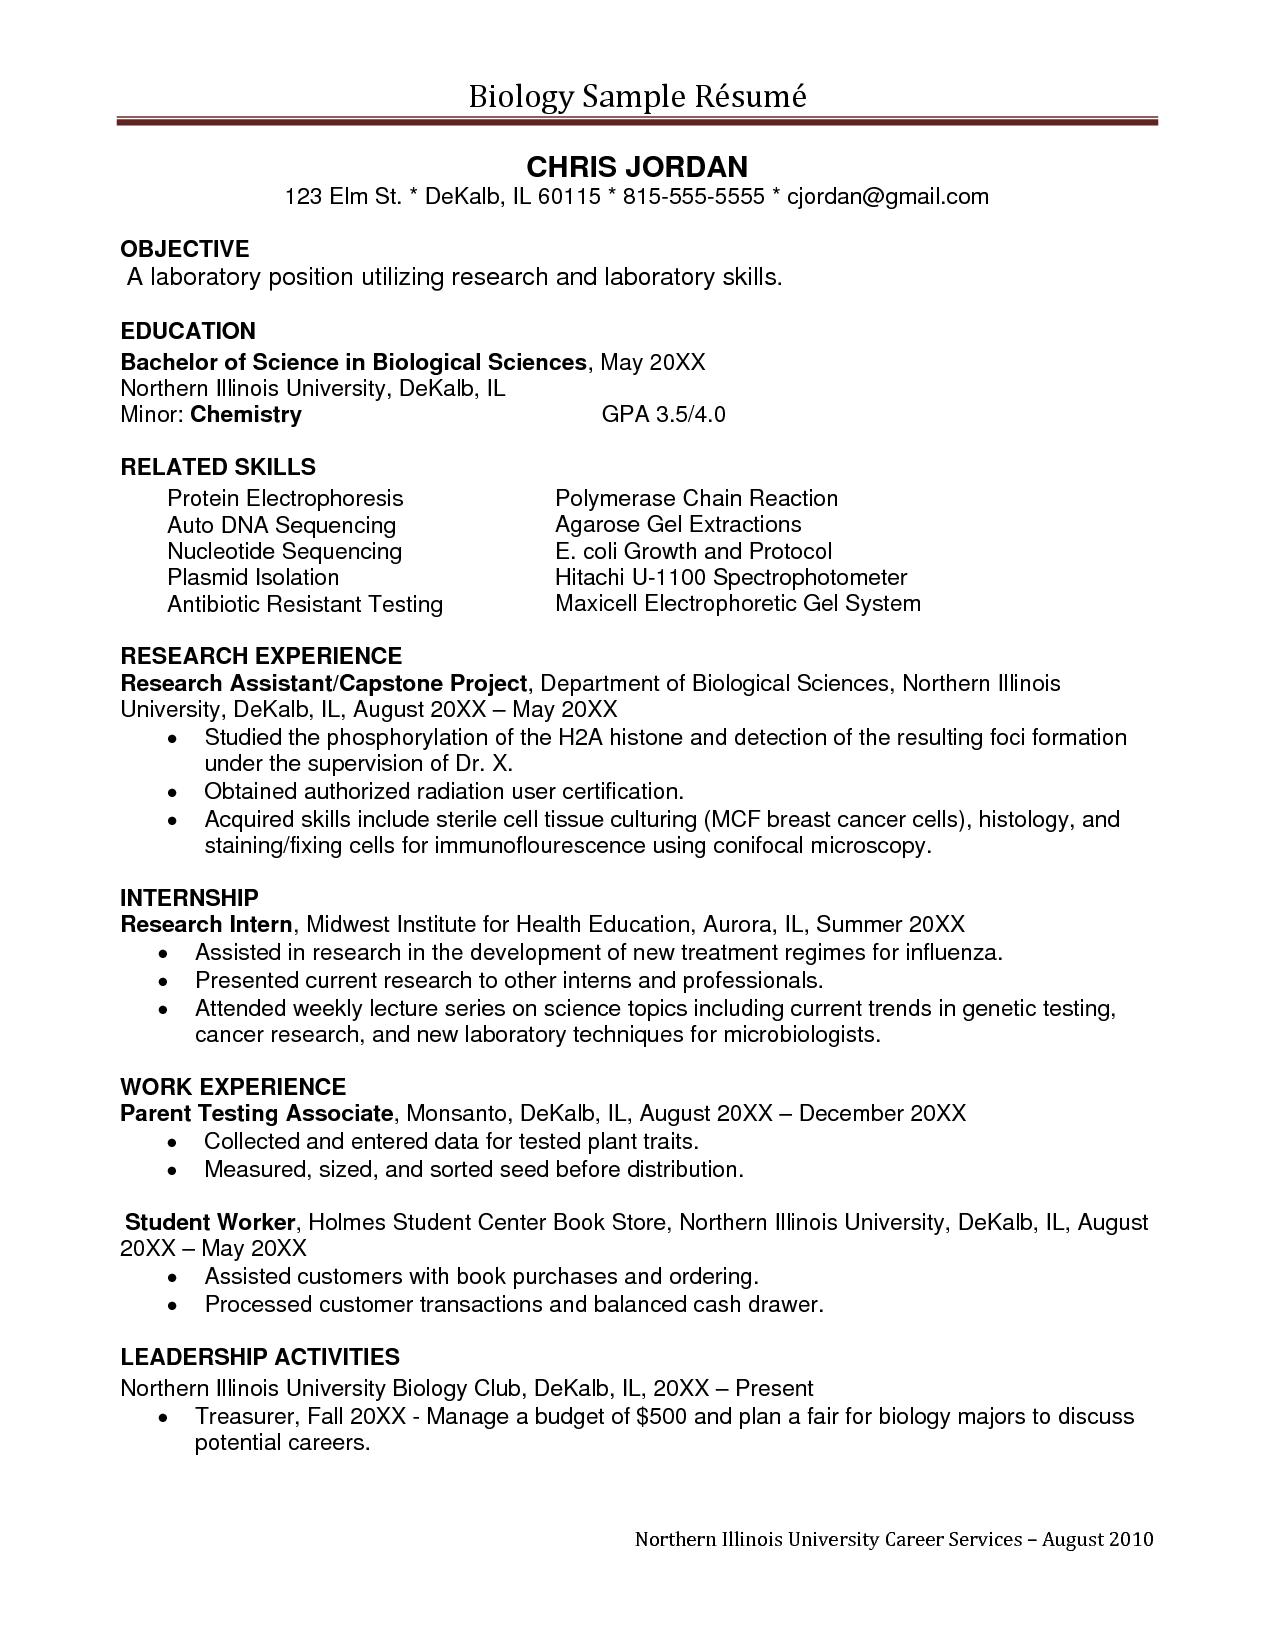 undergrad resume examples